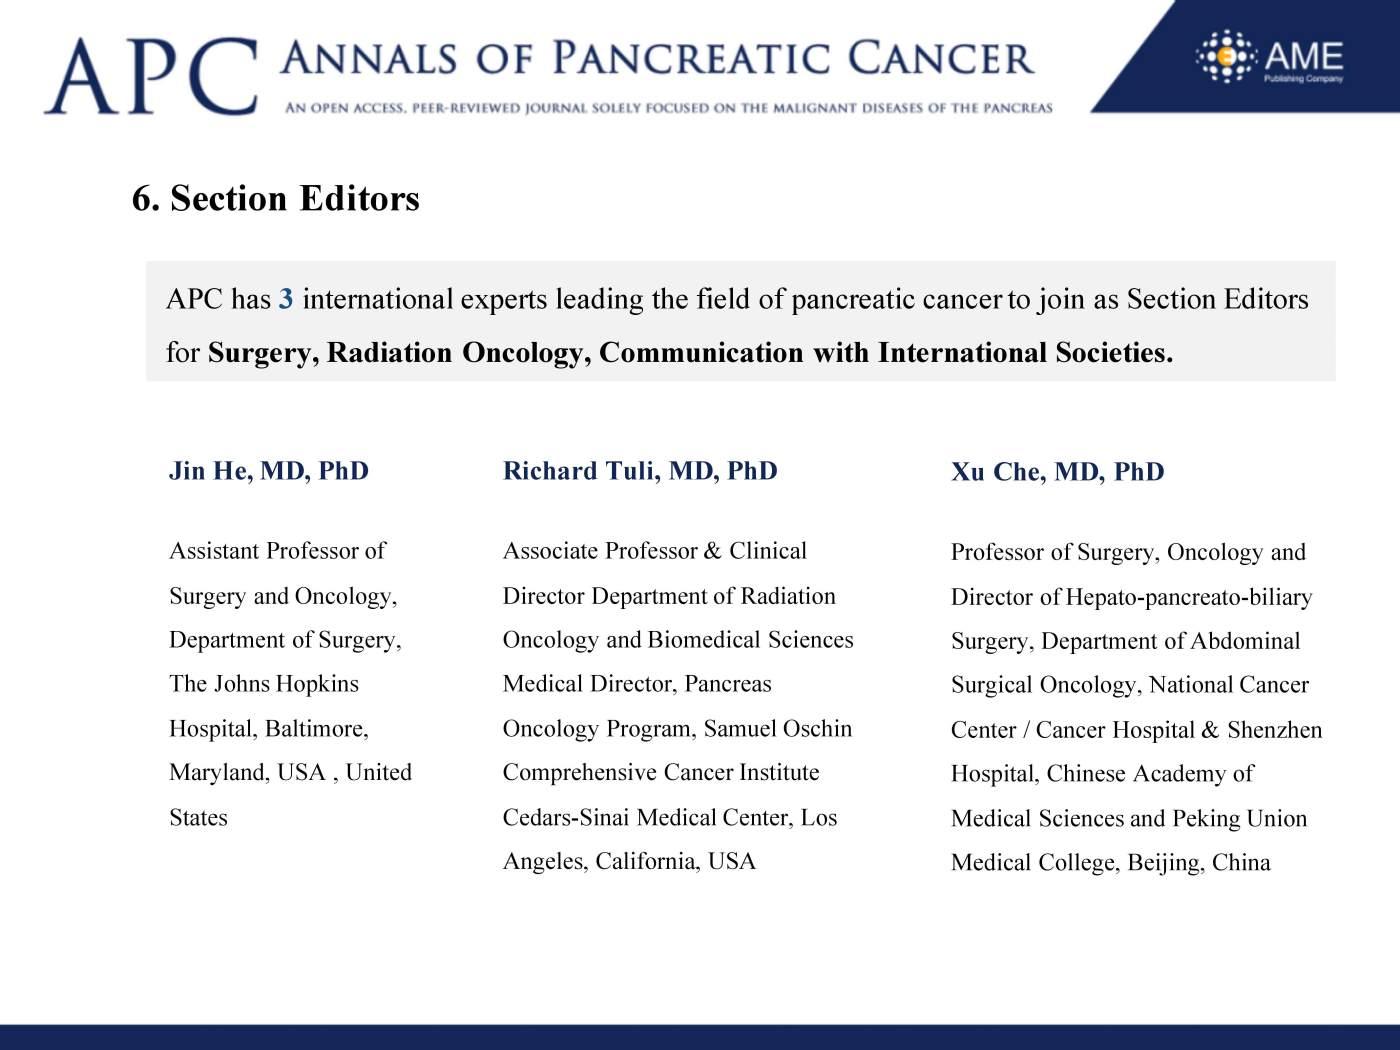 APC Annual Report 2018 - Annals of Pancreatic Cancer